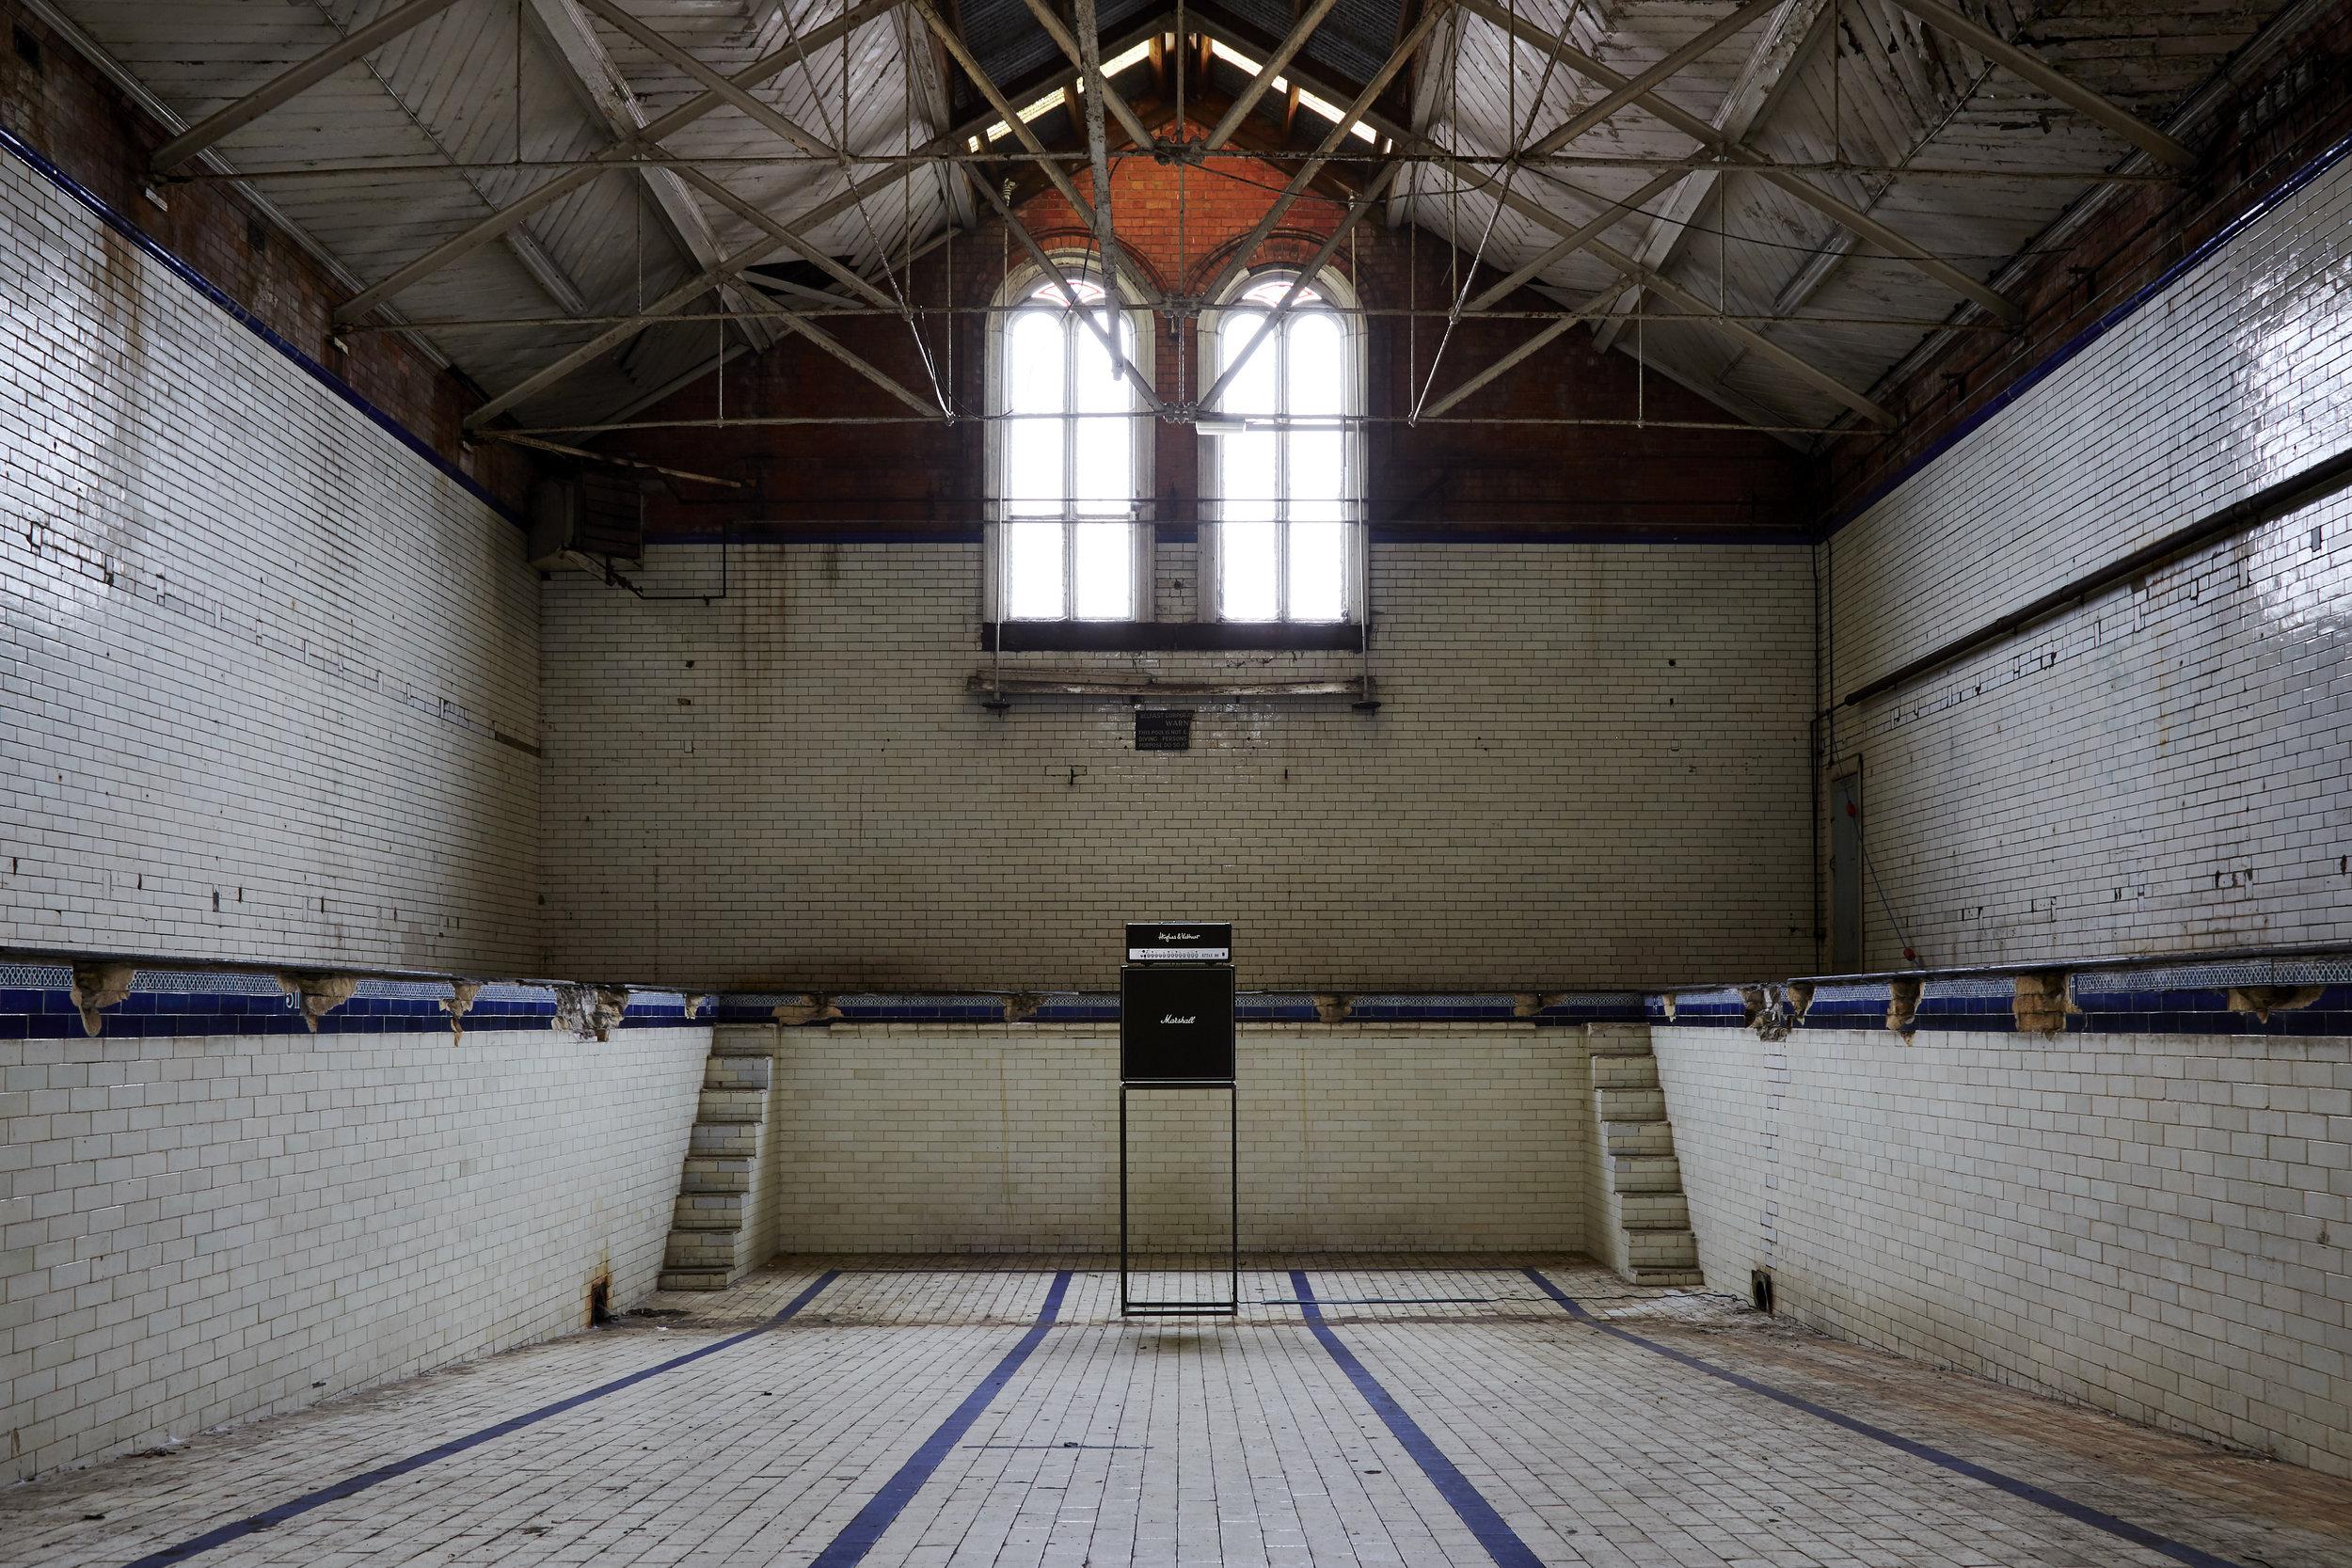 20161209 Liam Crichton Templemore Baths 001.jpg